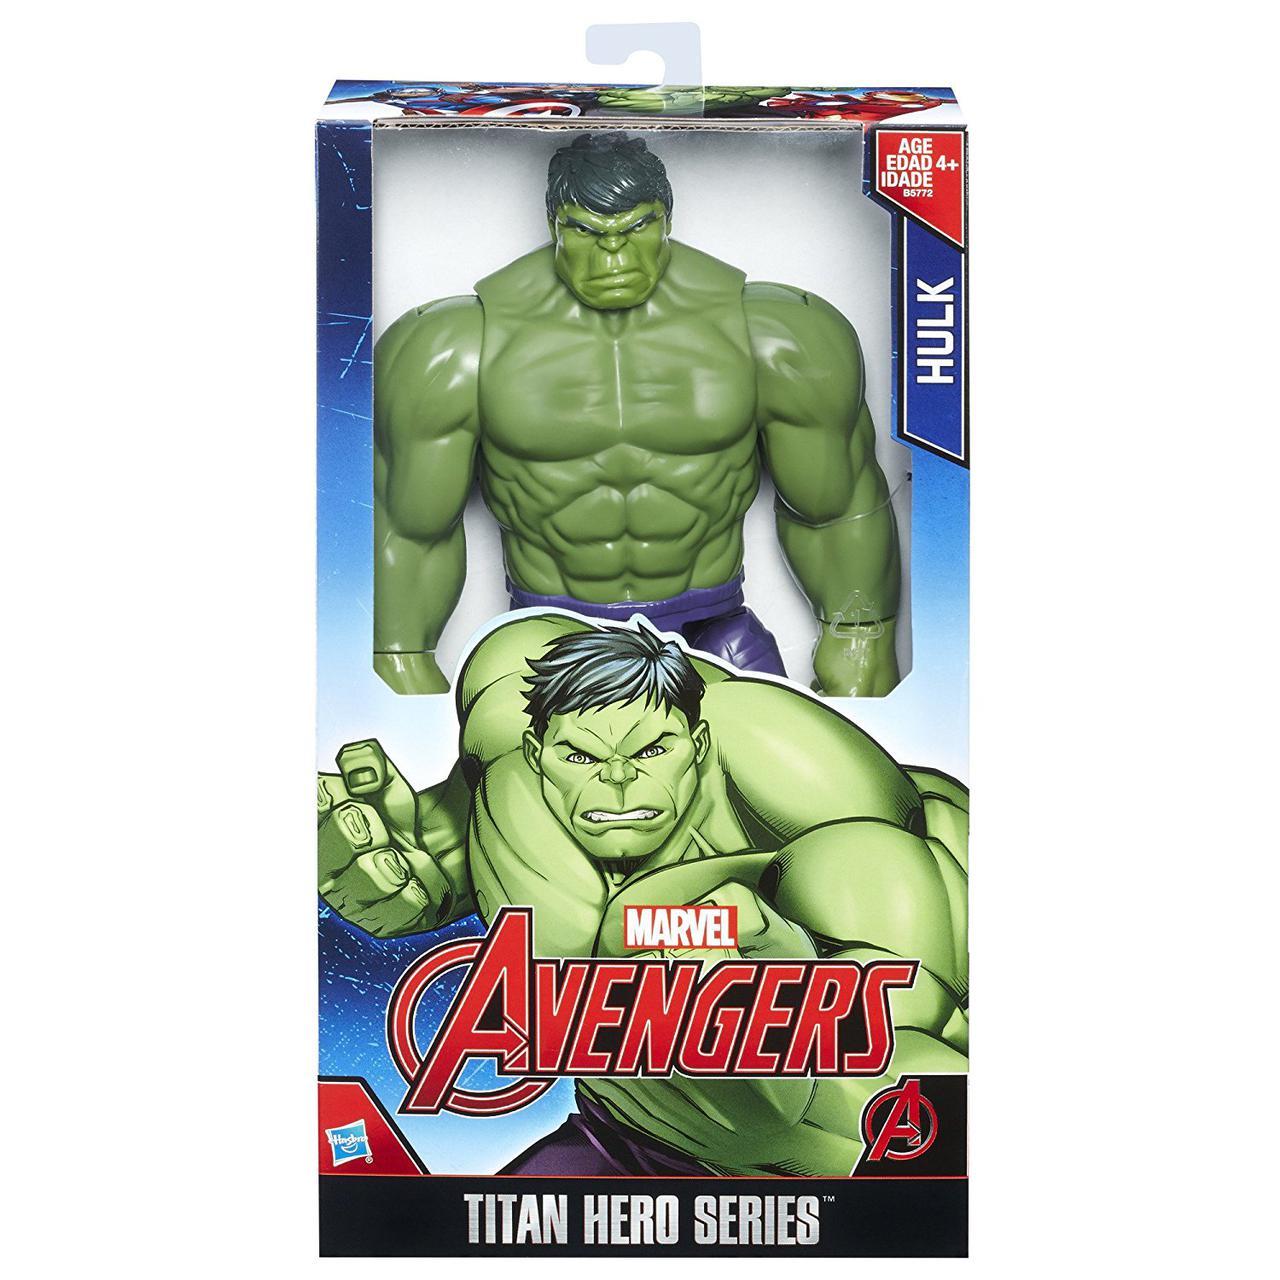 Халк фигурка супергероя Мстители от Хасбро/ Hulk Avengers Marvel Hasbro